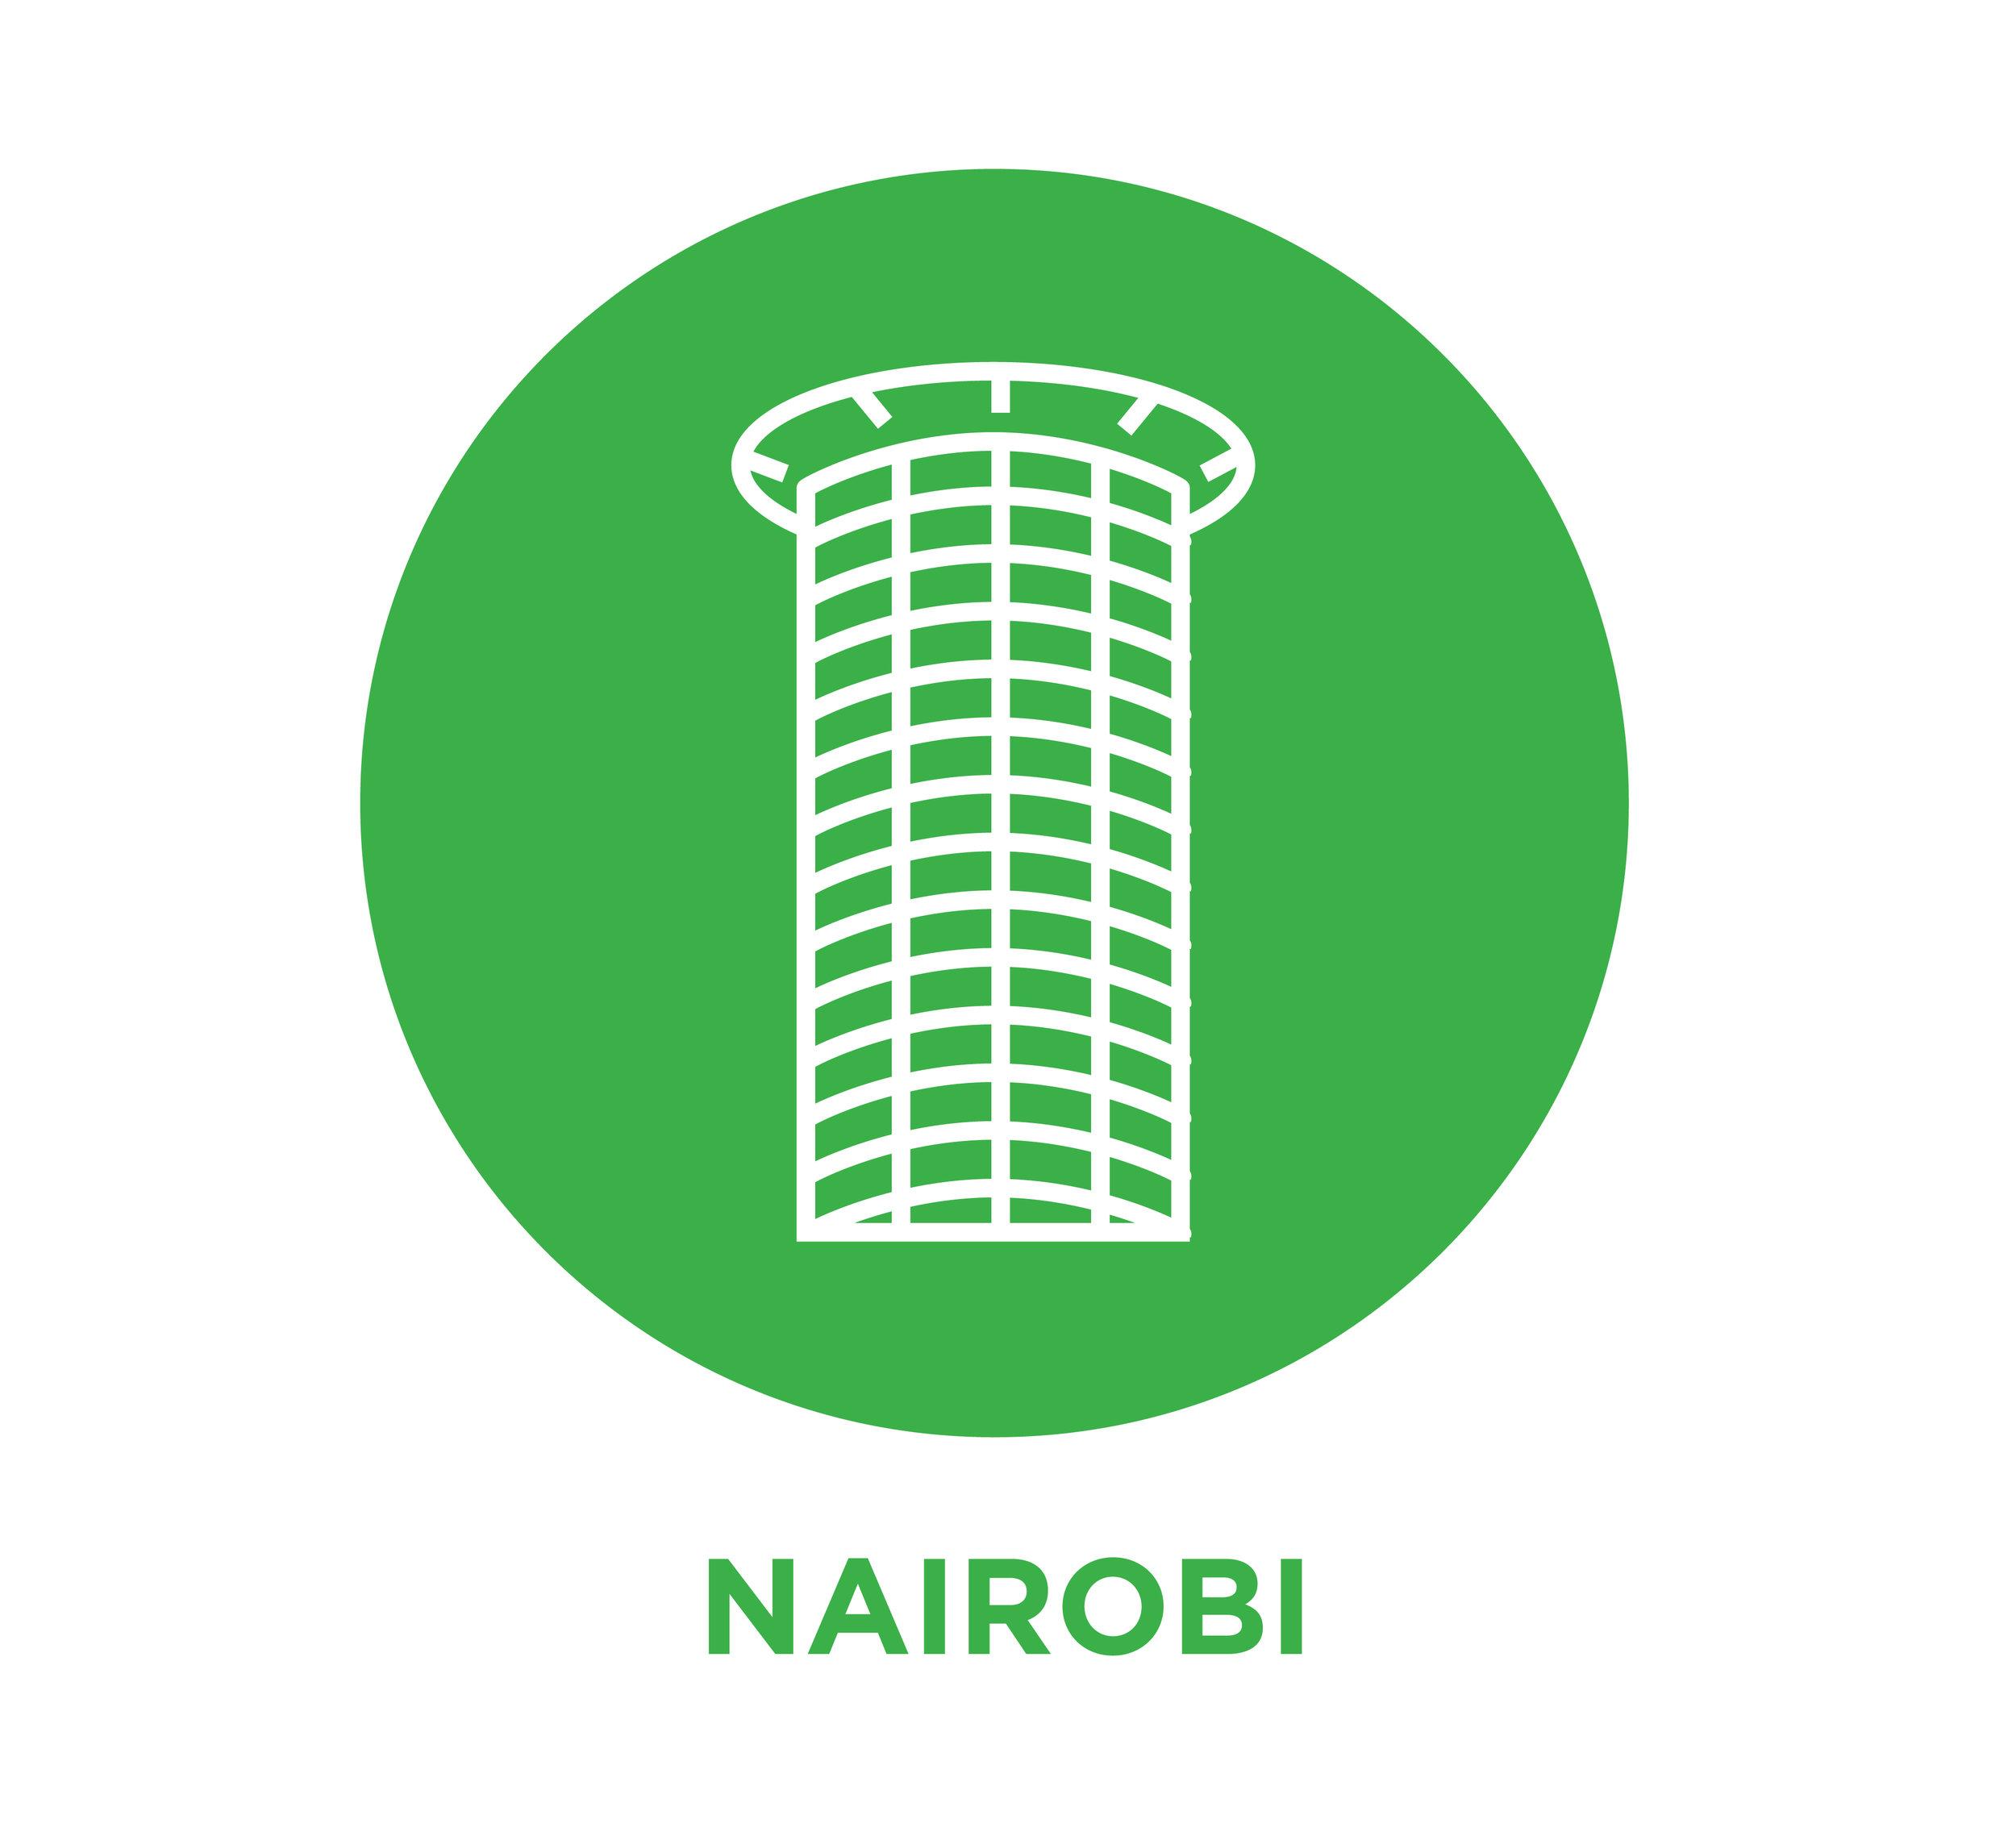 nairobi-10.jpg